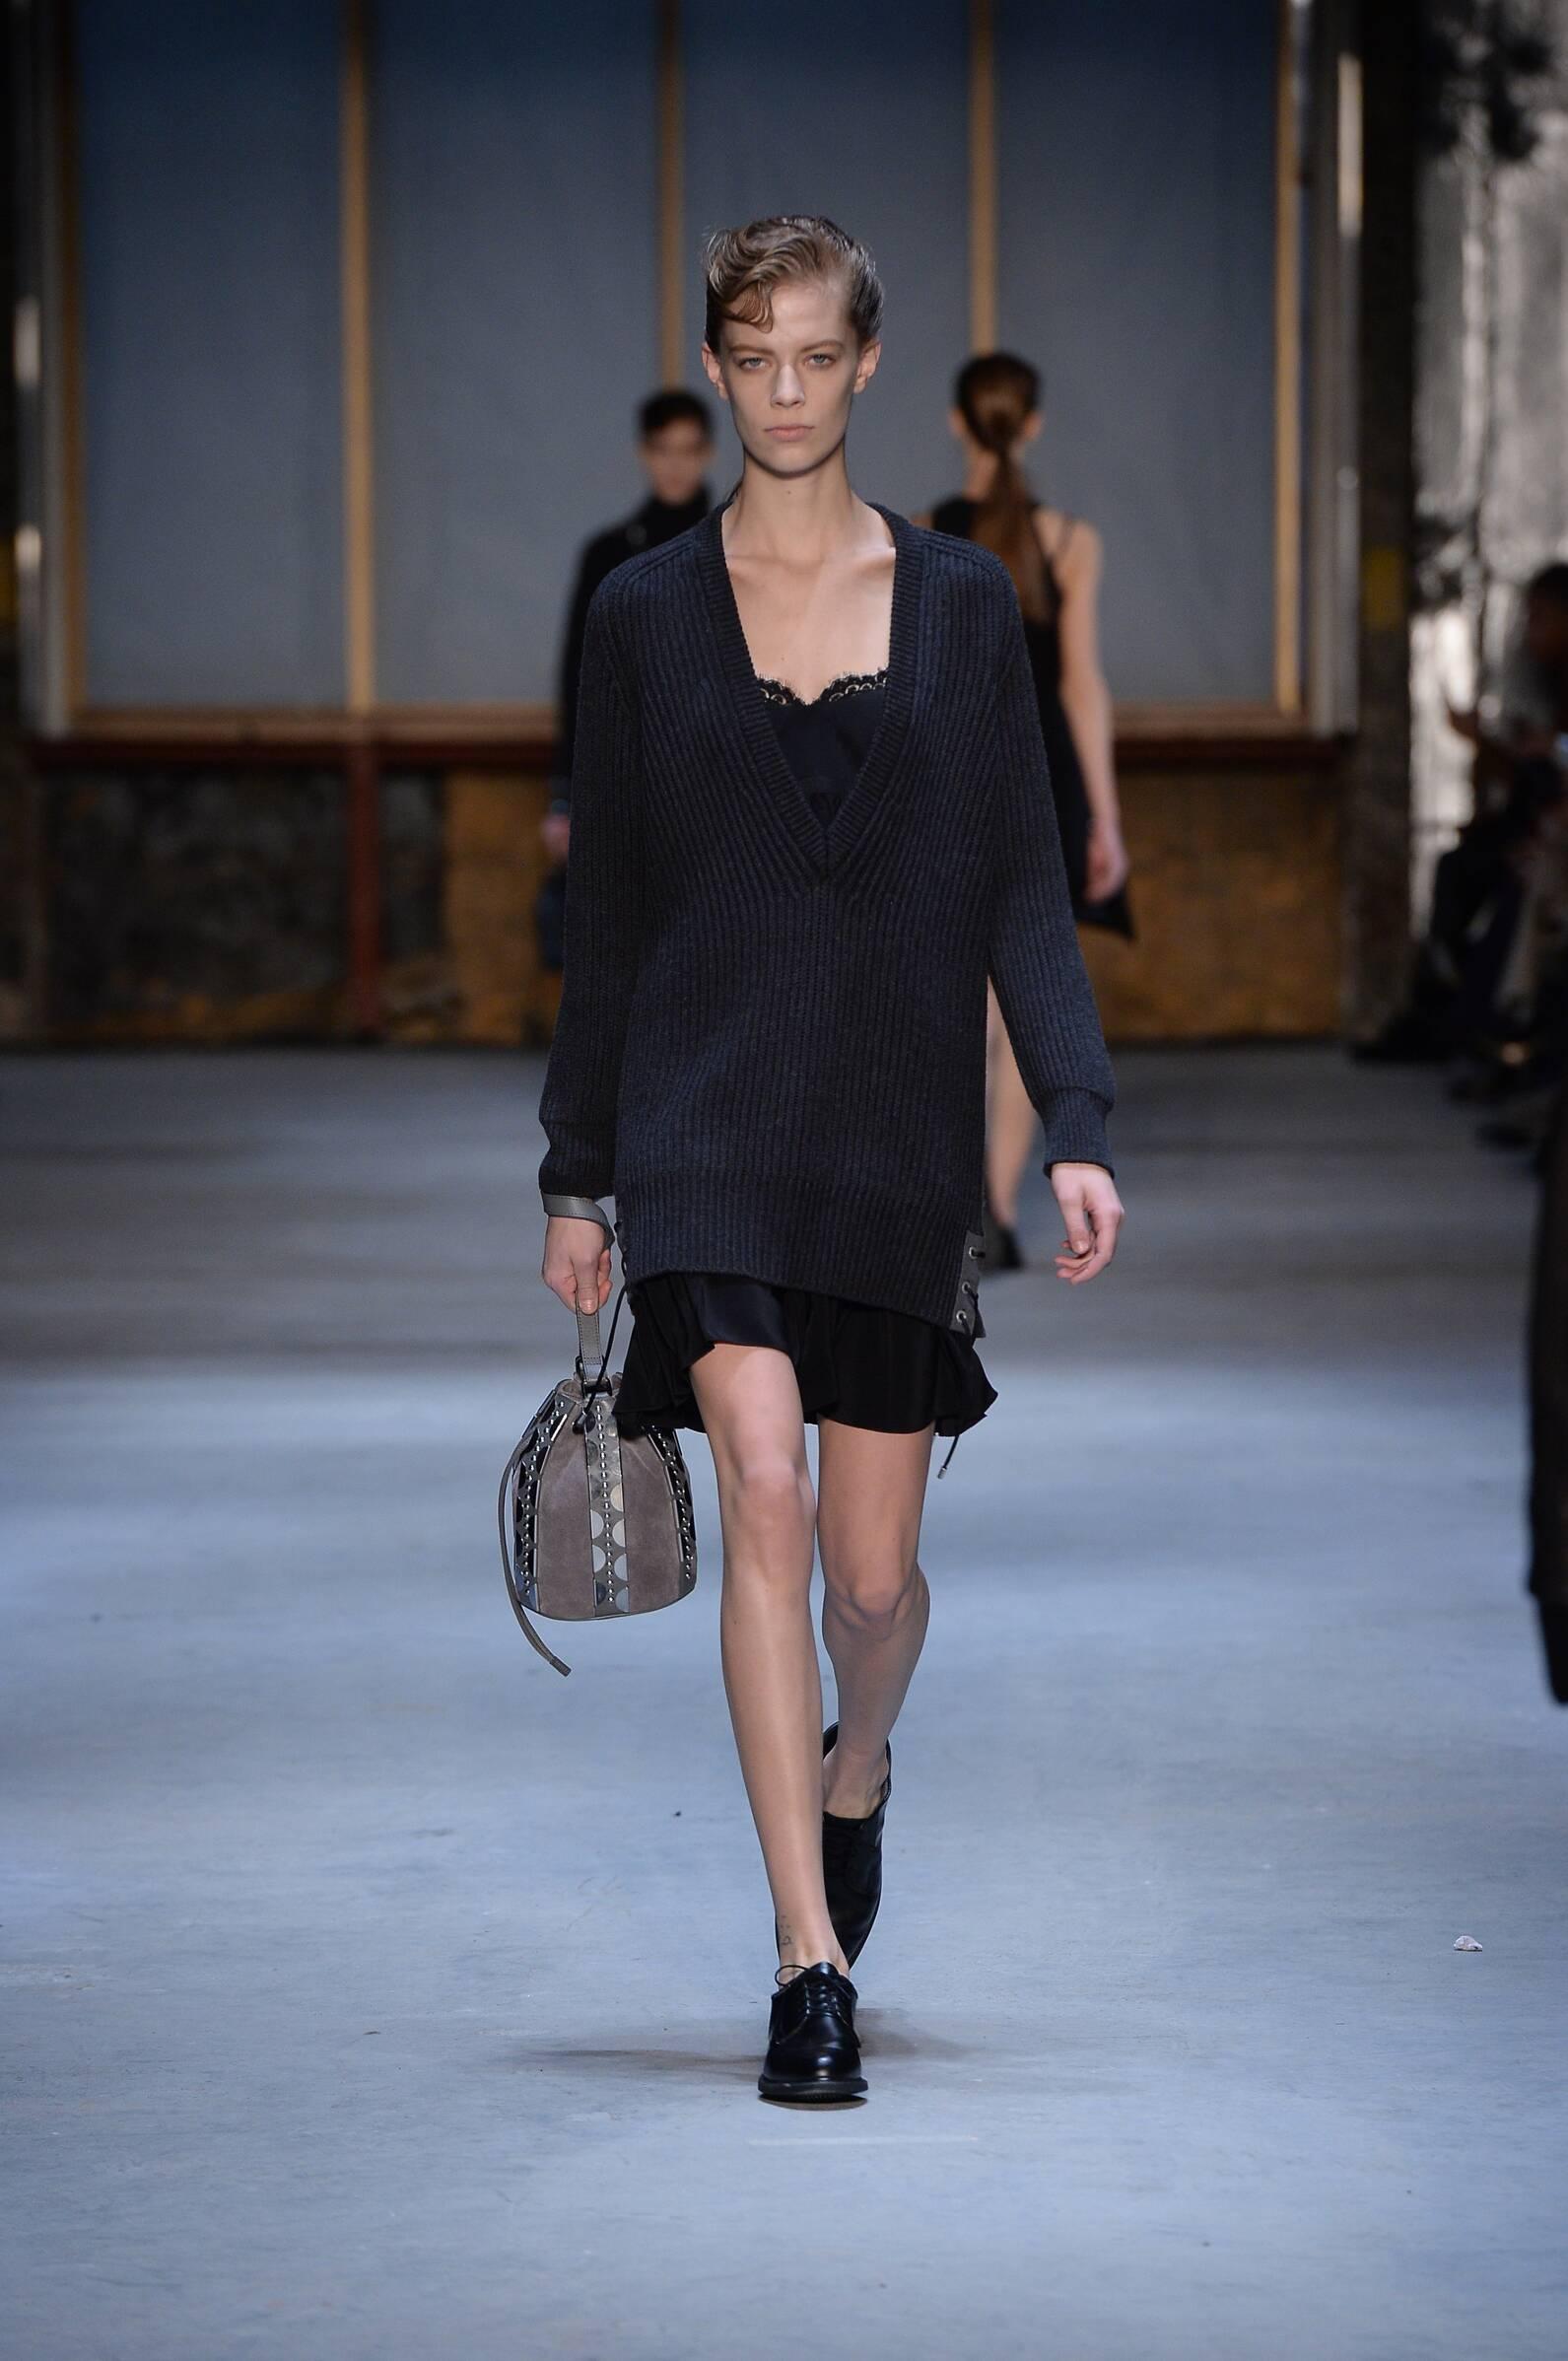 Diesel Black Gold Fall Winter 2015 16 Womenswear Collection New York Fashion Week Fashion Show